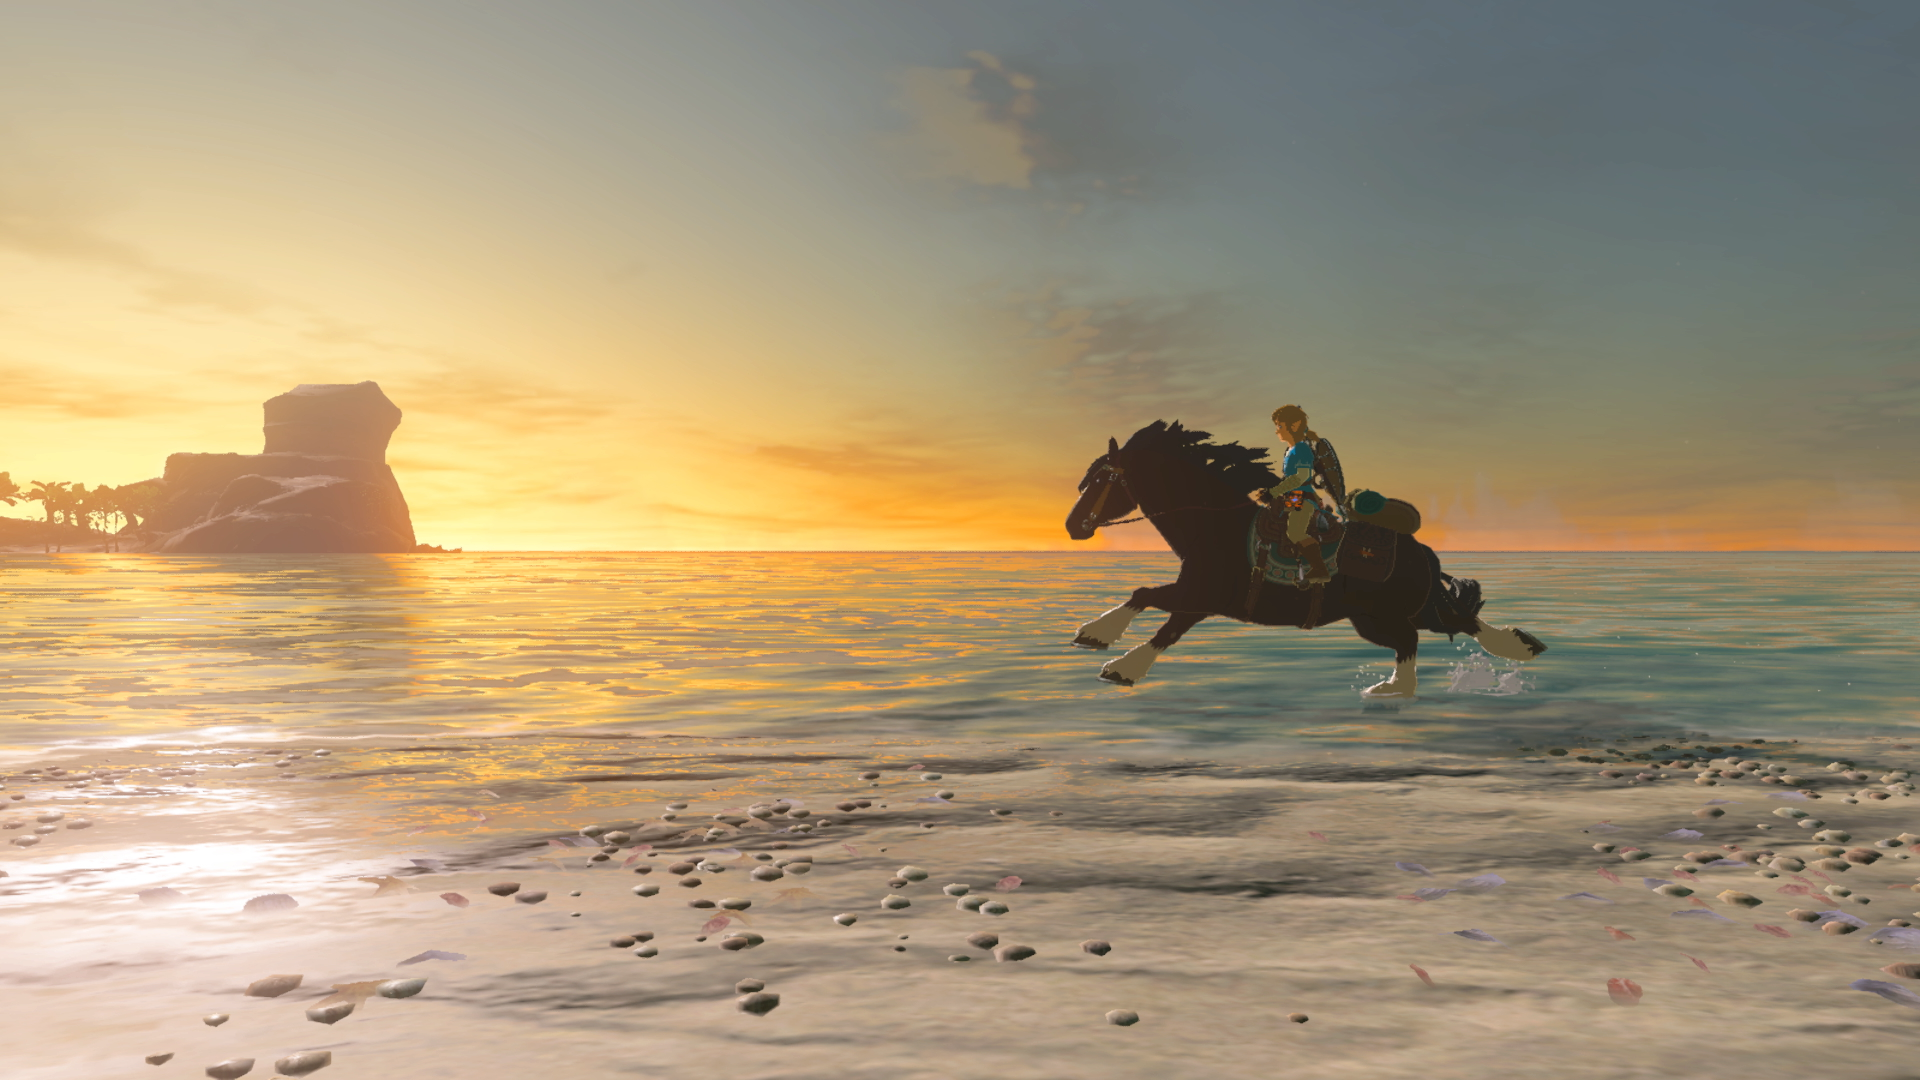 The Legend of Zelda: Breath of the Wild image 39